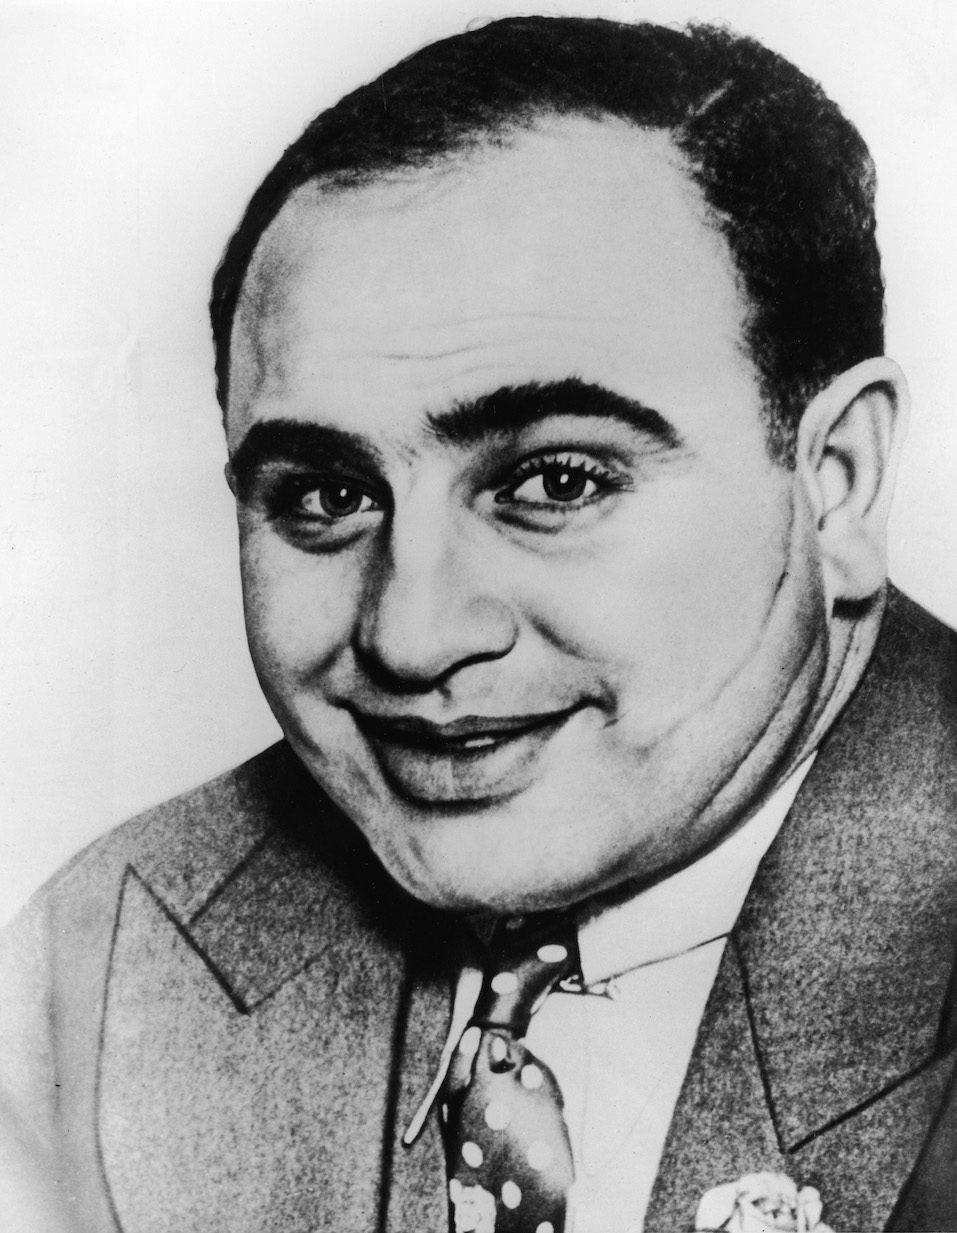 American gangster Al Capone